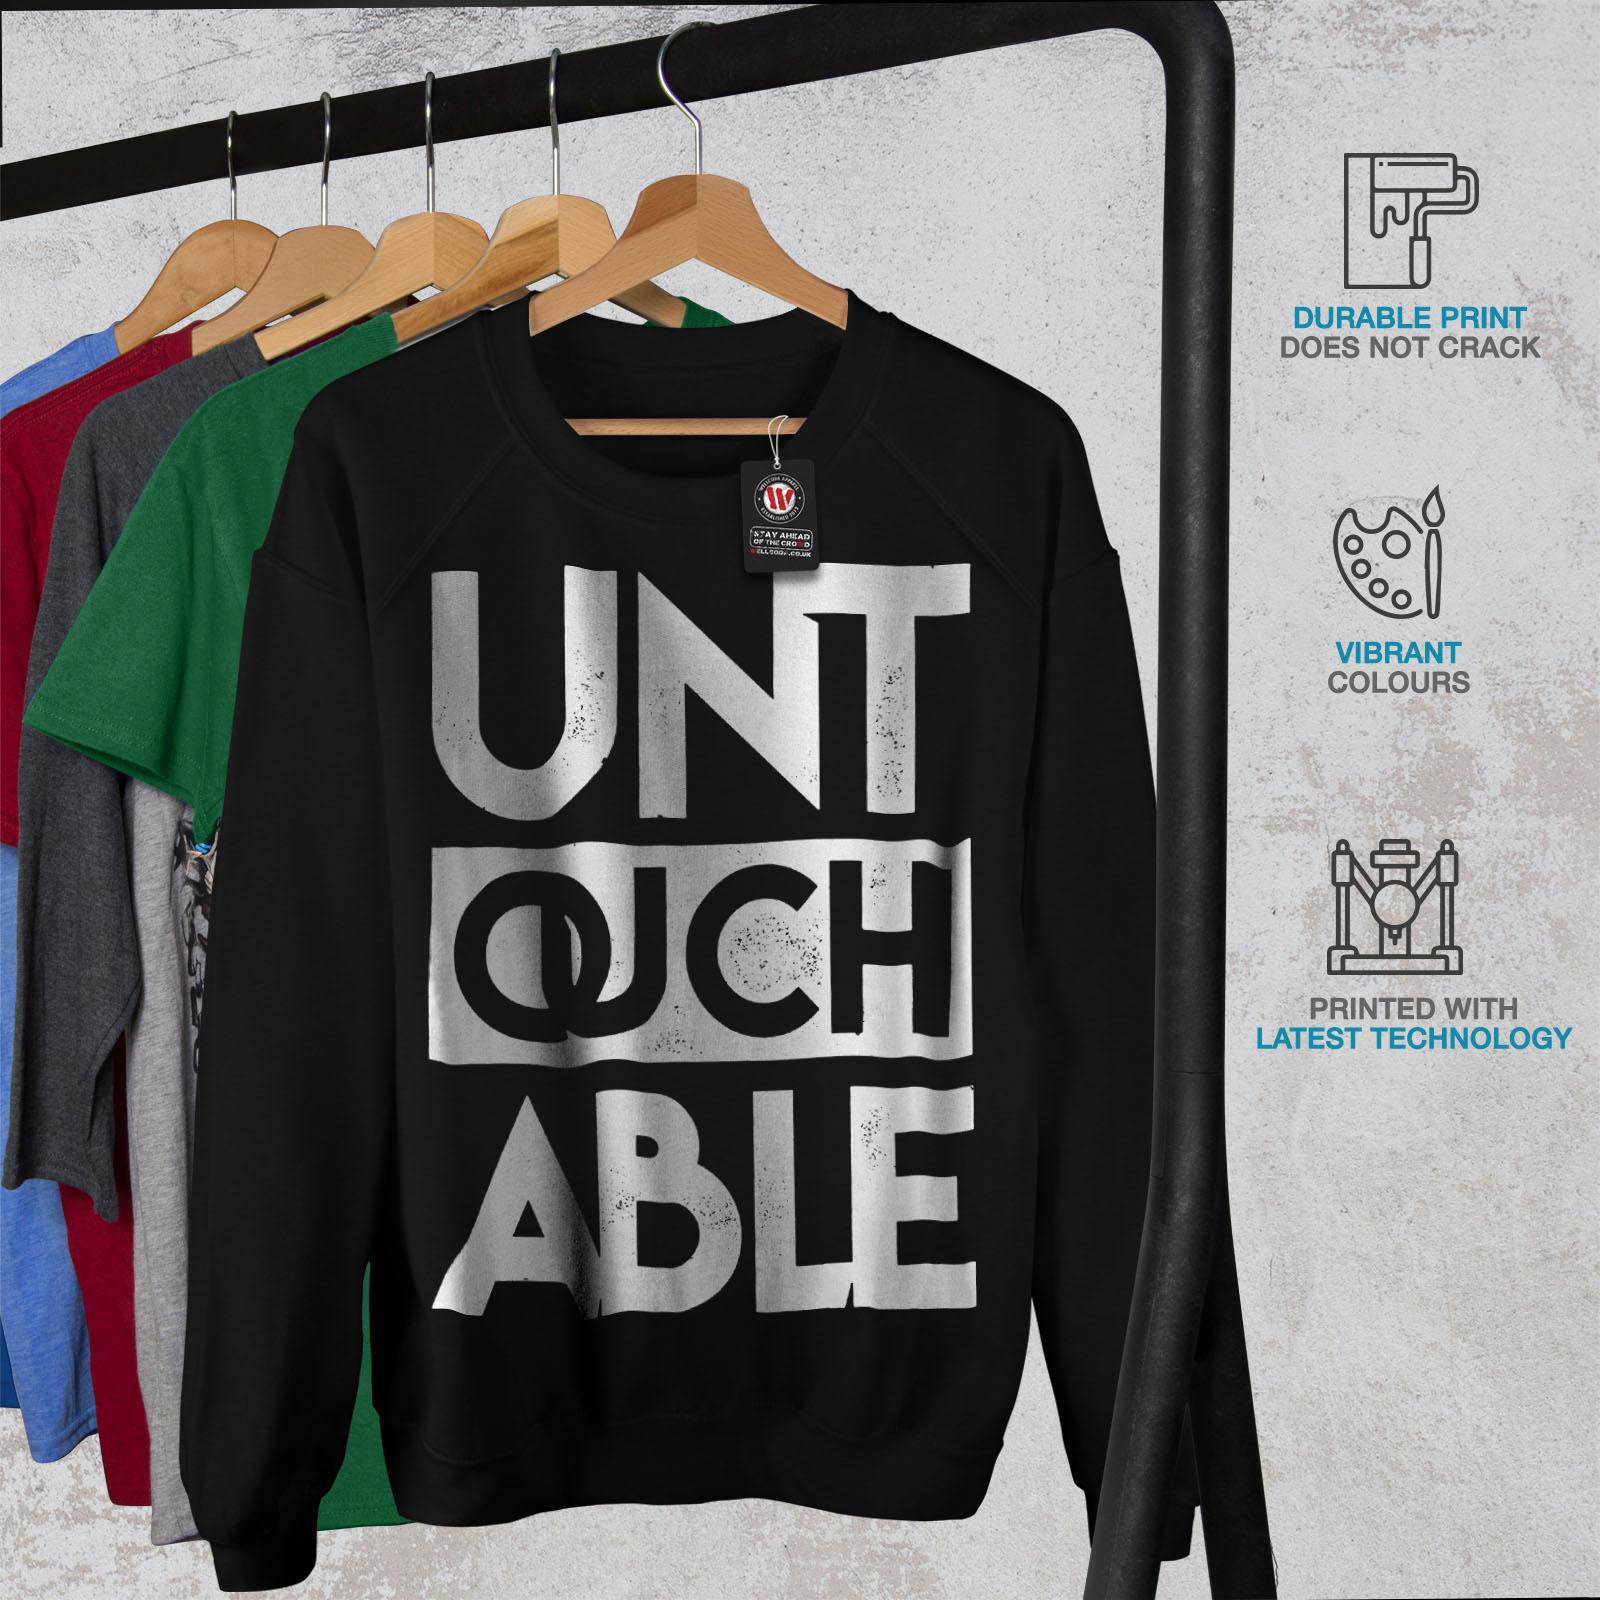 Funny Casual Jumper wellcoda Untouchable Text Slogan Mens Sweatshirt